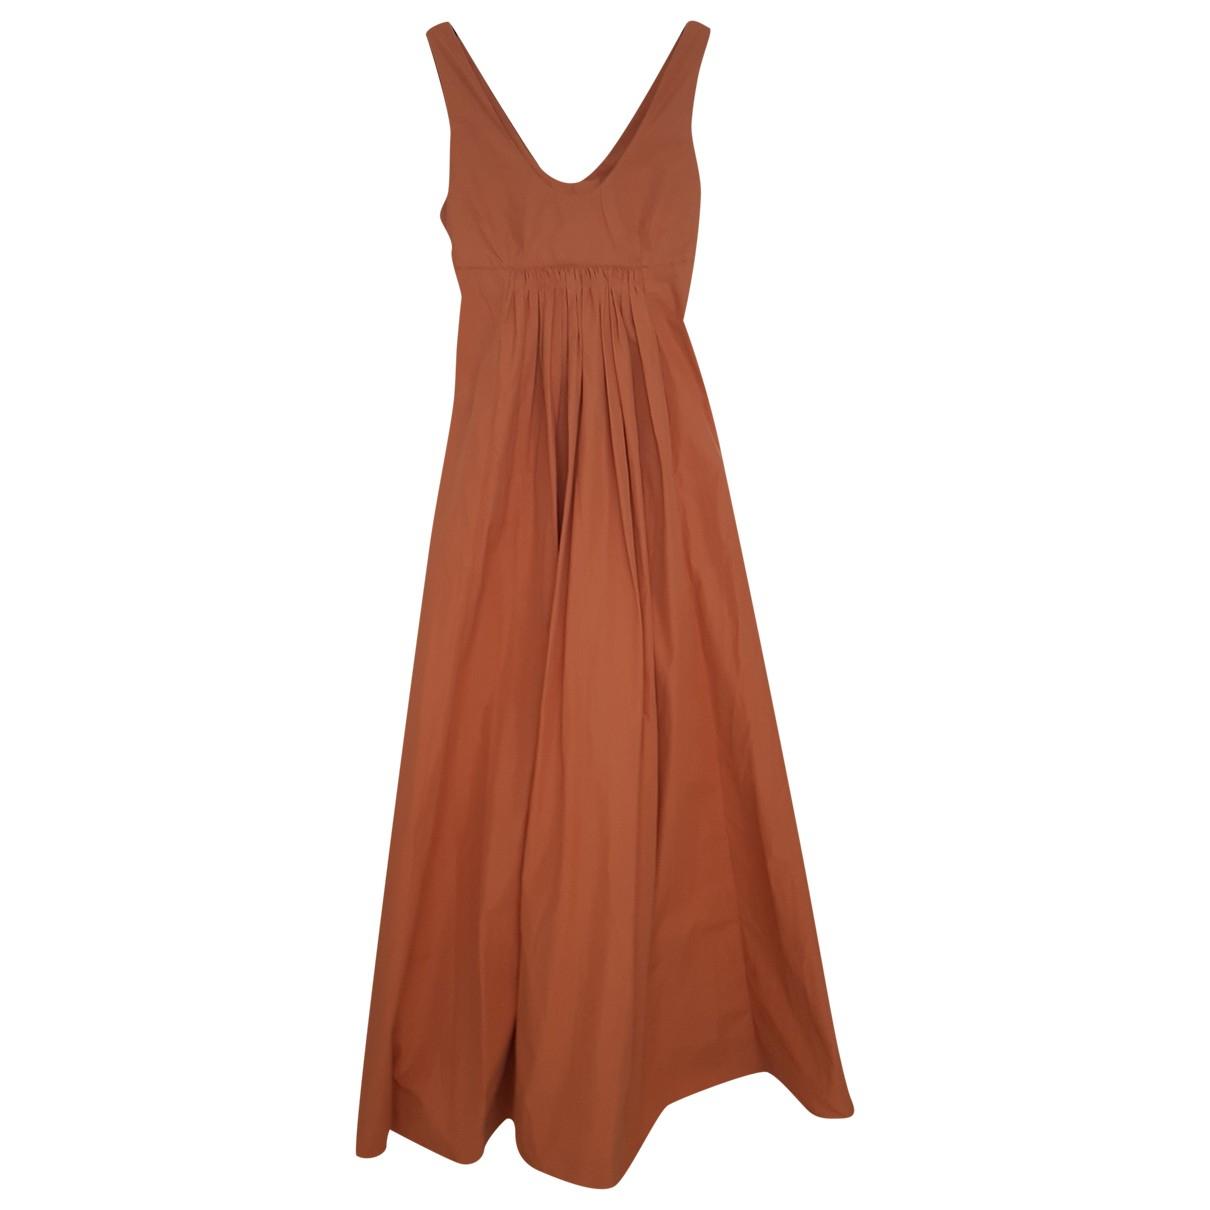 Three Graces London \N Orange Cotton dress for Women 8 US